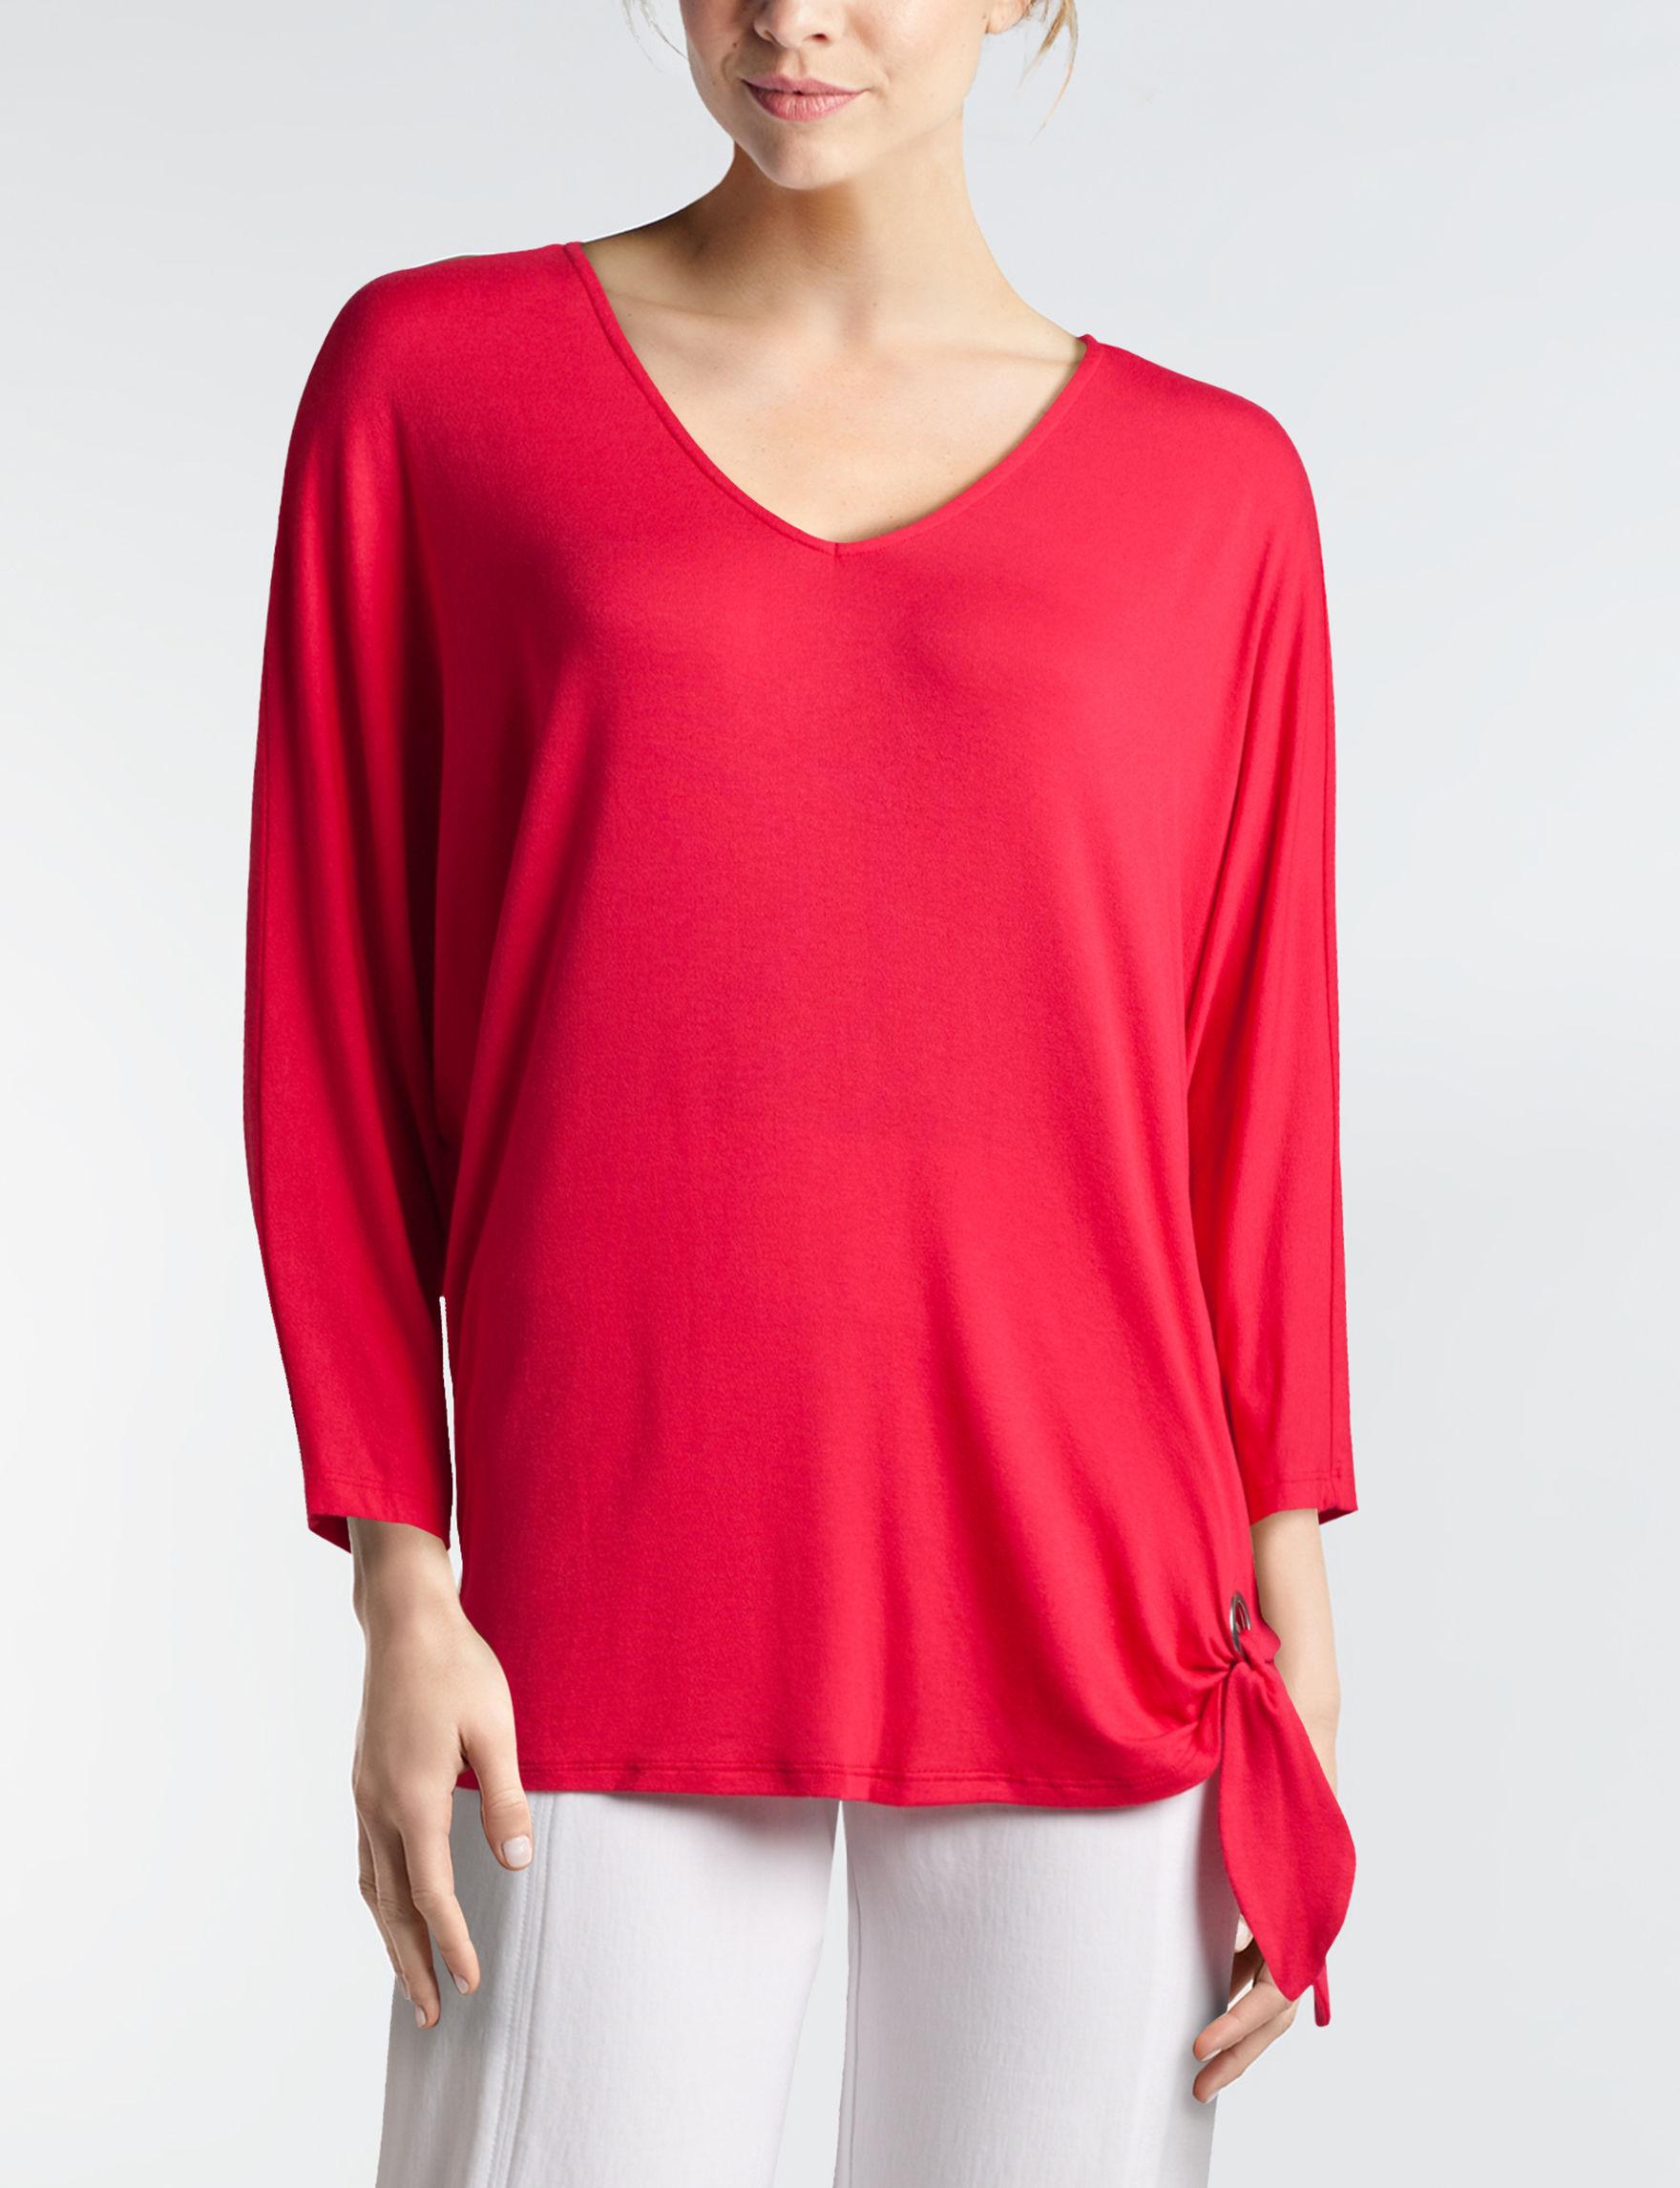 John Paul Richard Red Shirts & Blouses